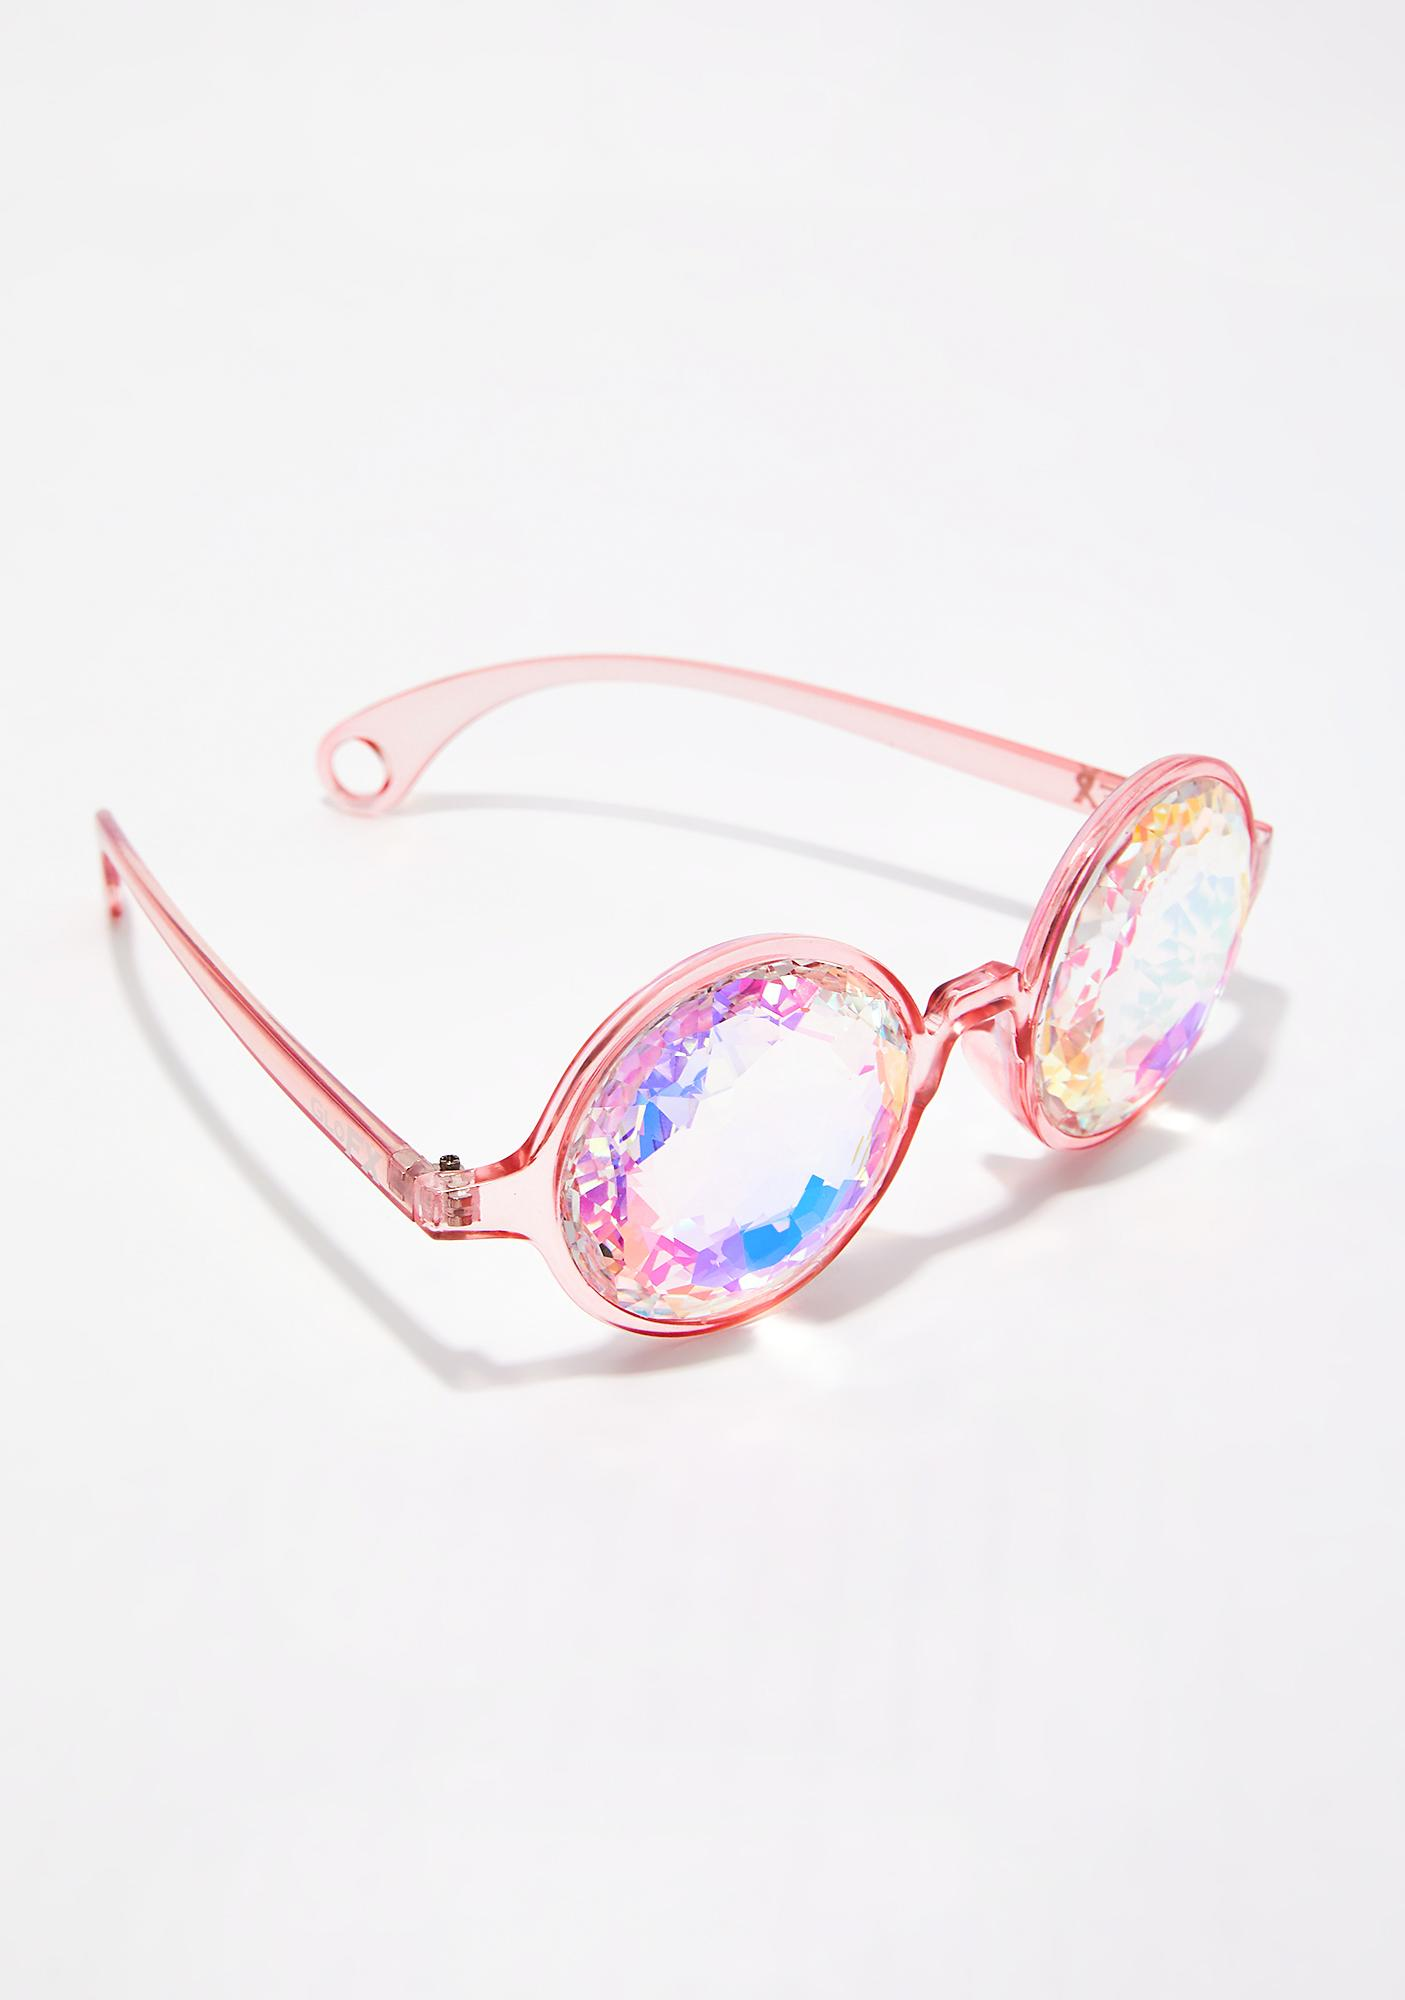 GloFX Rainbow Kaleidoscope Glasses